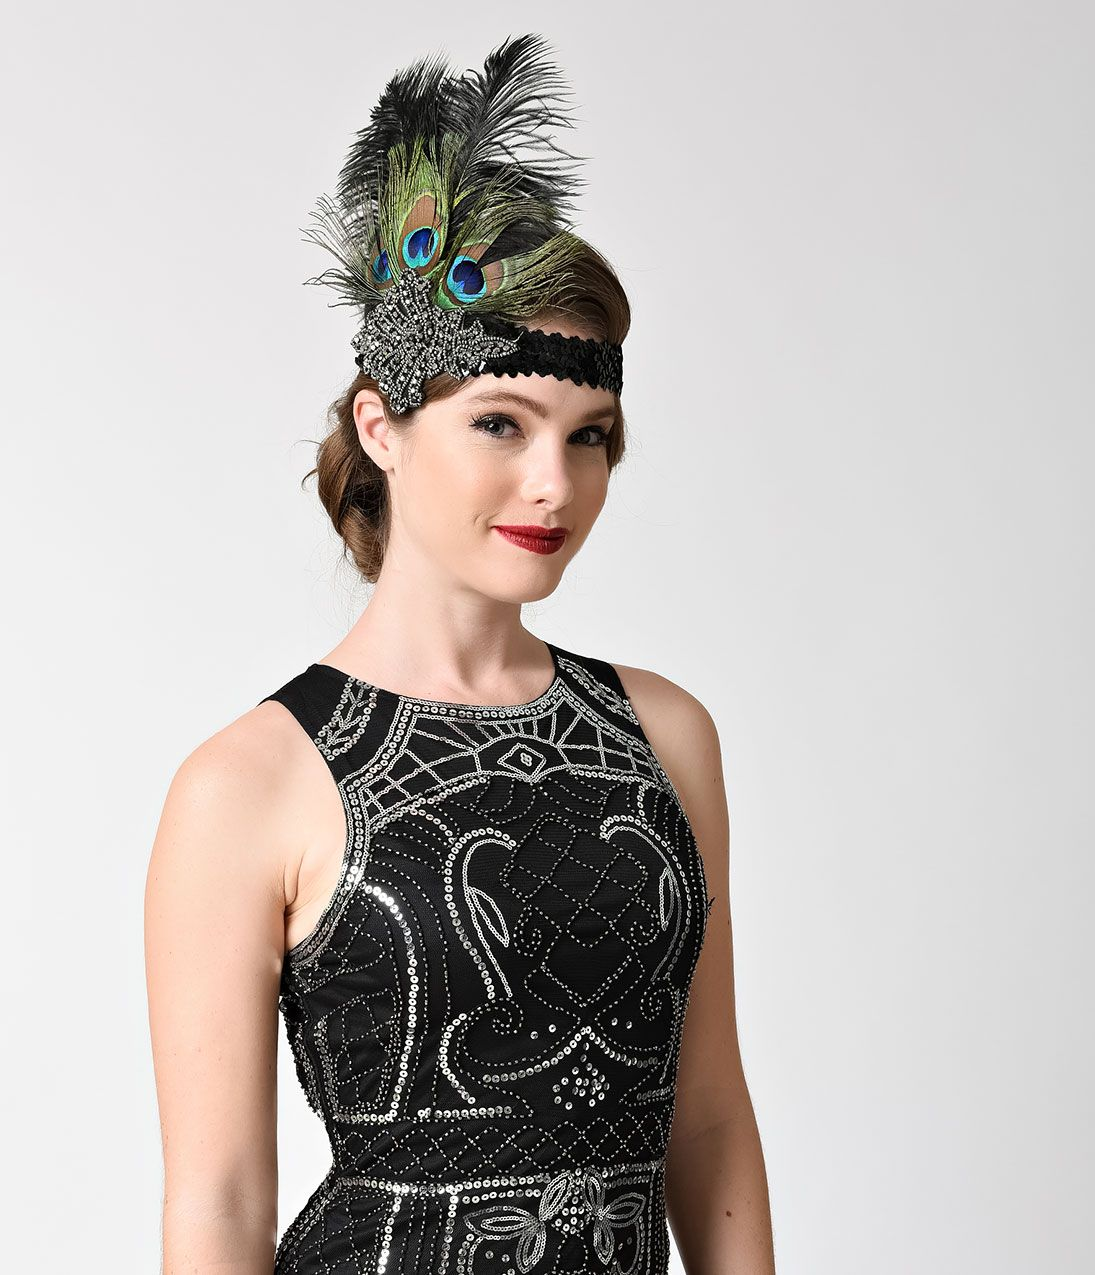 Black dress s style headbands color dress pinterest shops